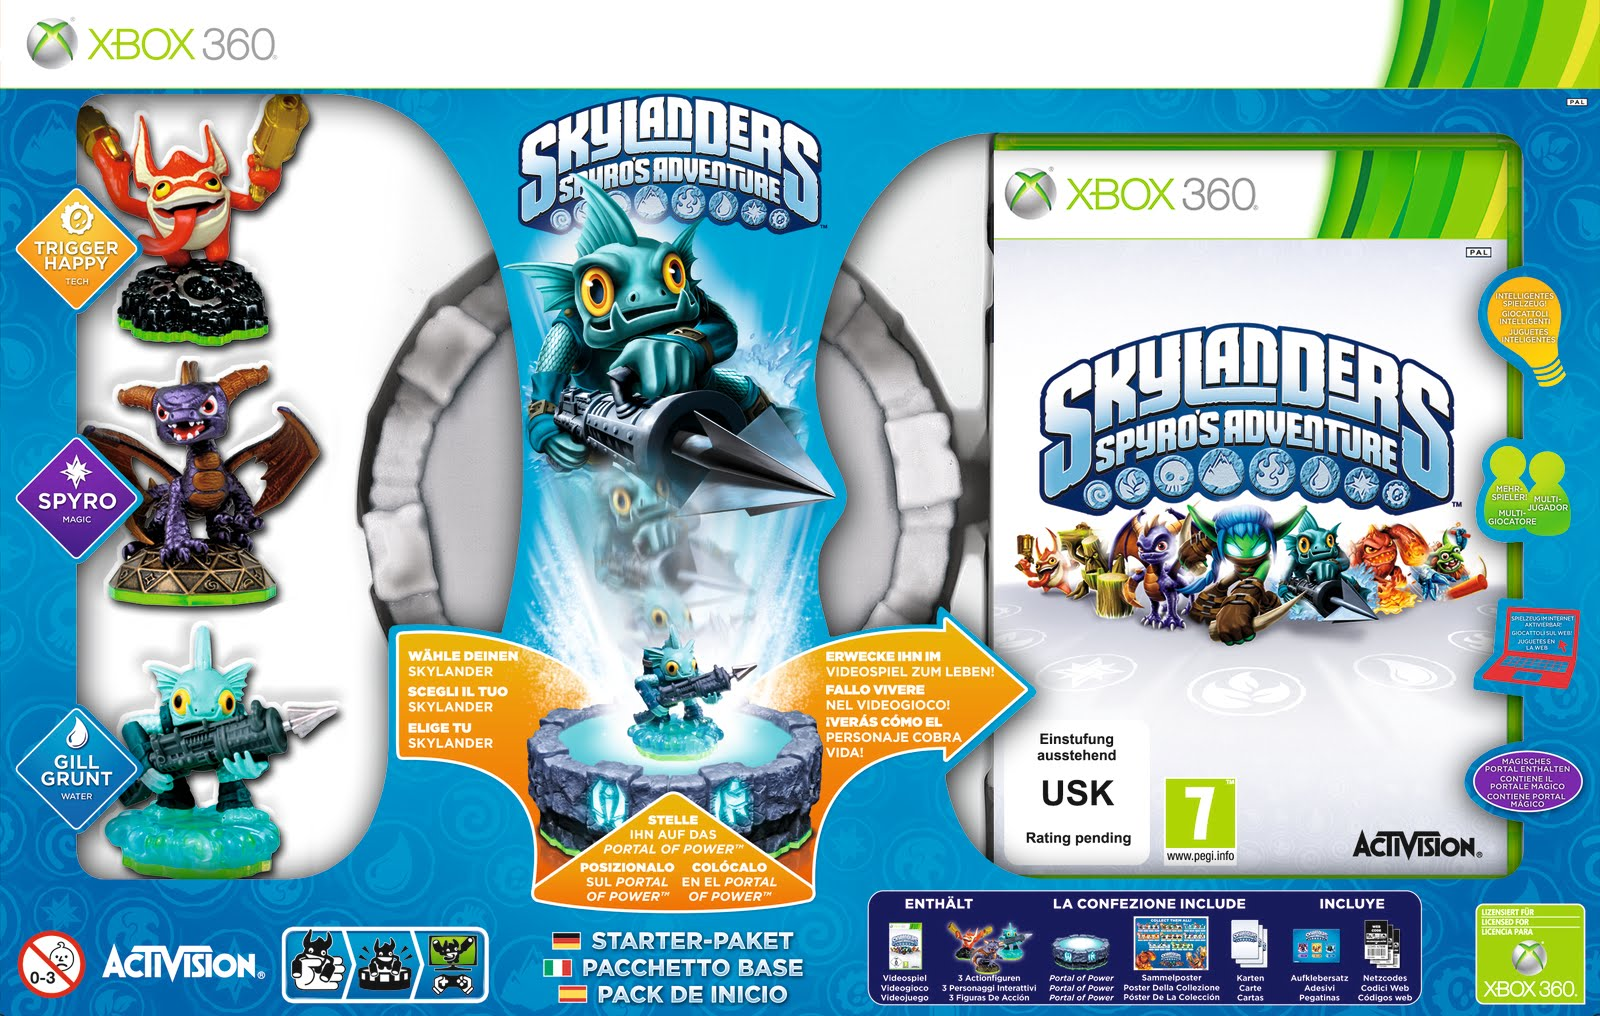 XBOX 360: Skylanders Spyros Adventure